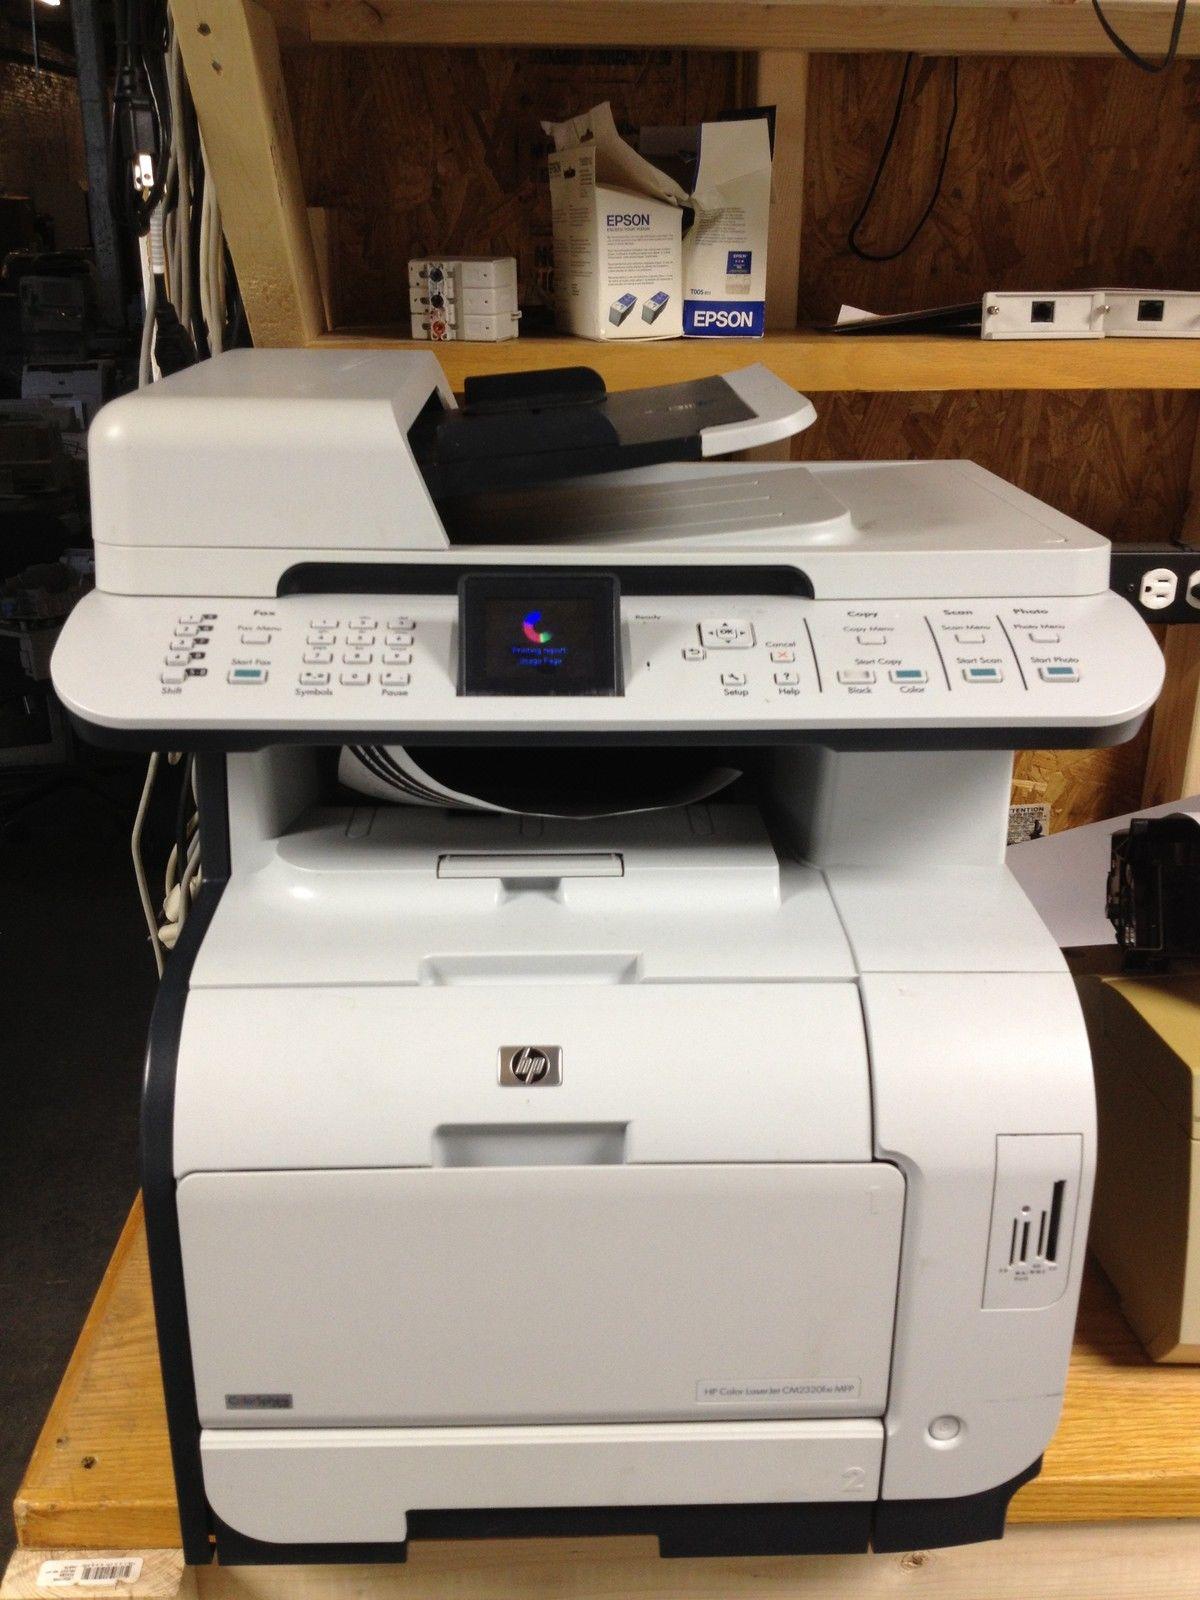 hp laserjet cm2320fxi mfp all in one laser printer with toners - Hp Color Laserjet Cm2320fxi Mfp